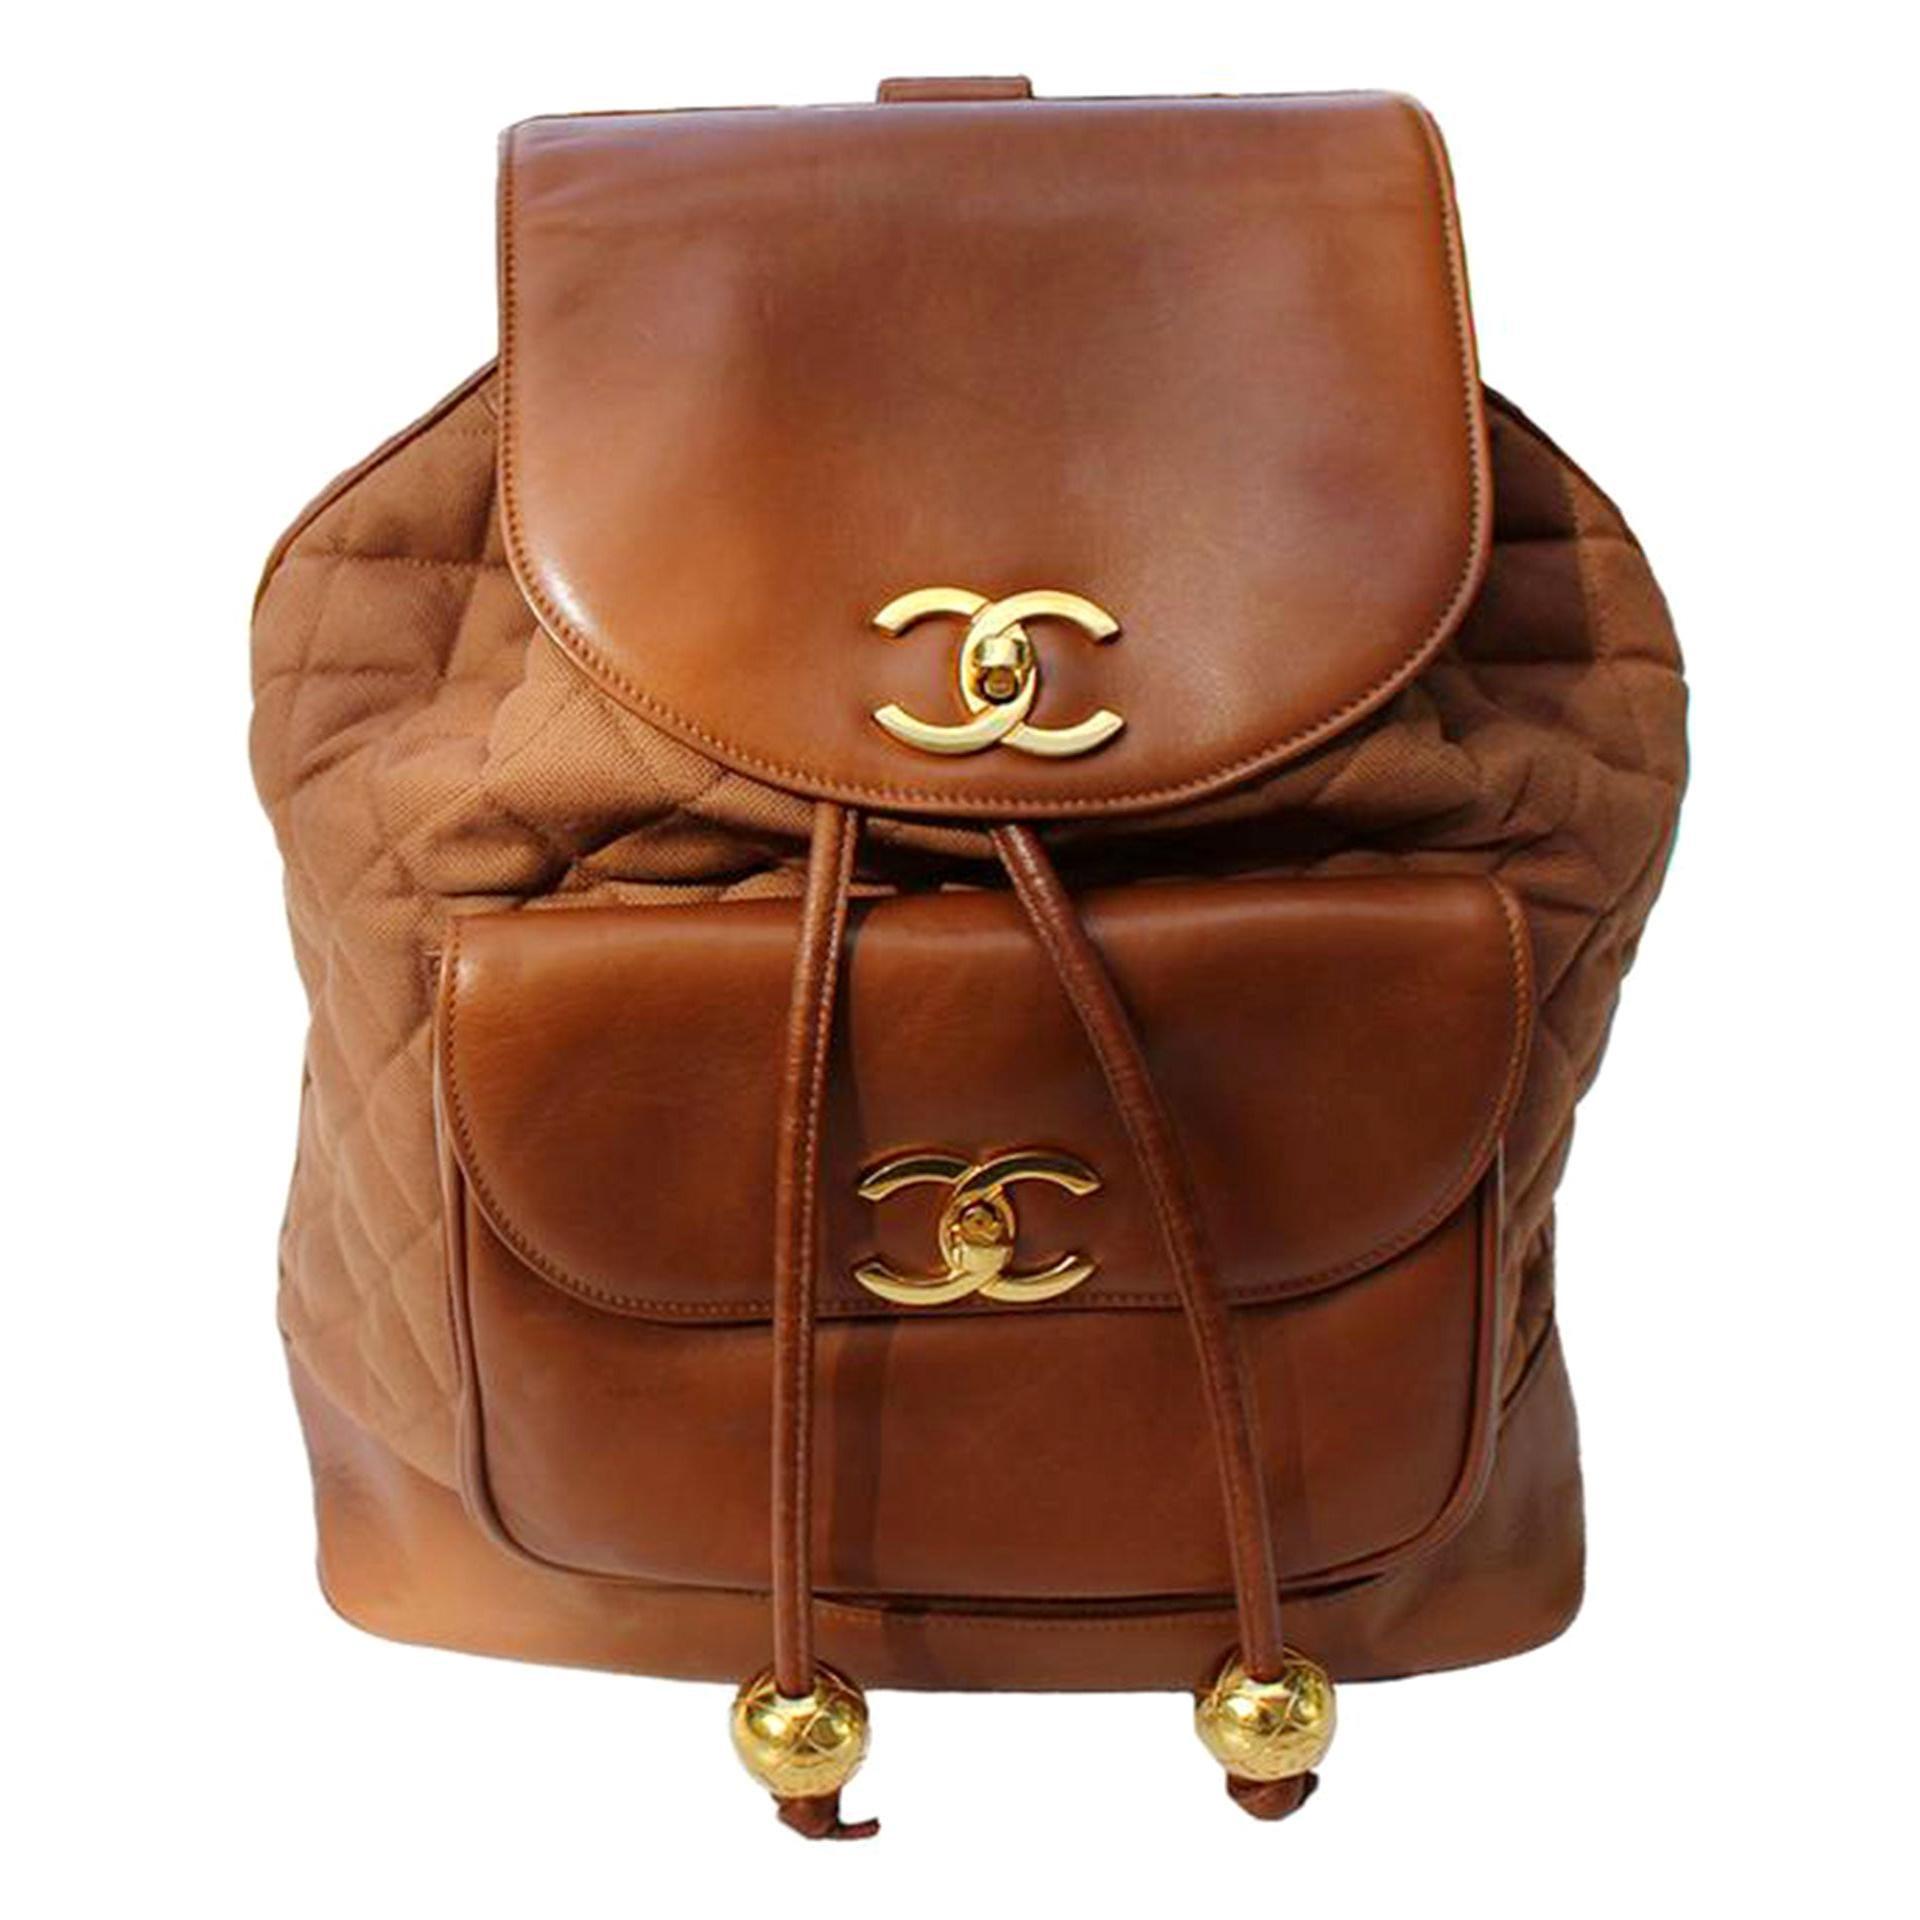 Chanel XL Cognac Brown Vintage 90's Backpack